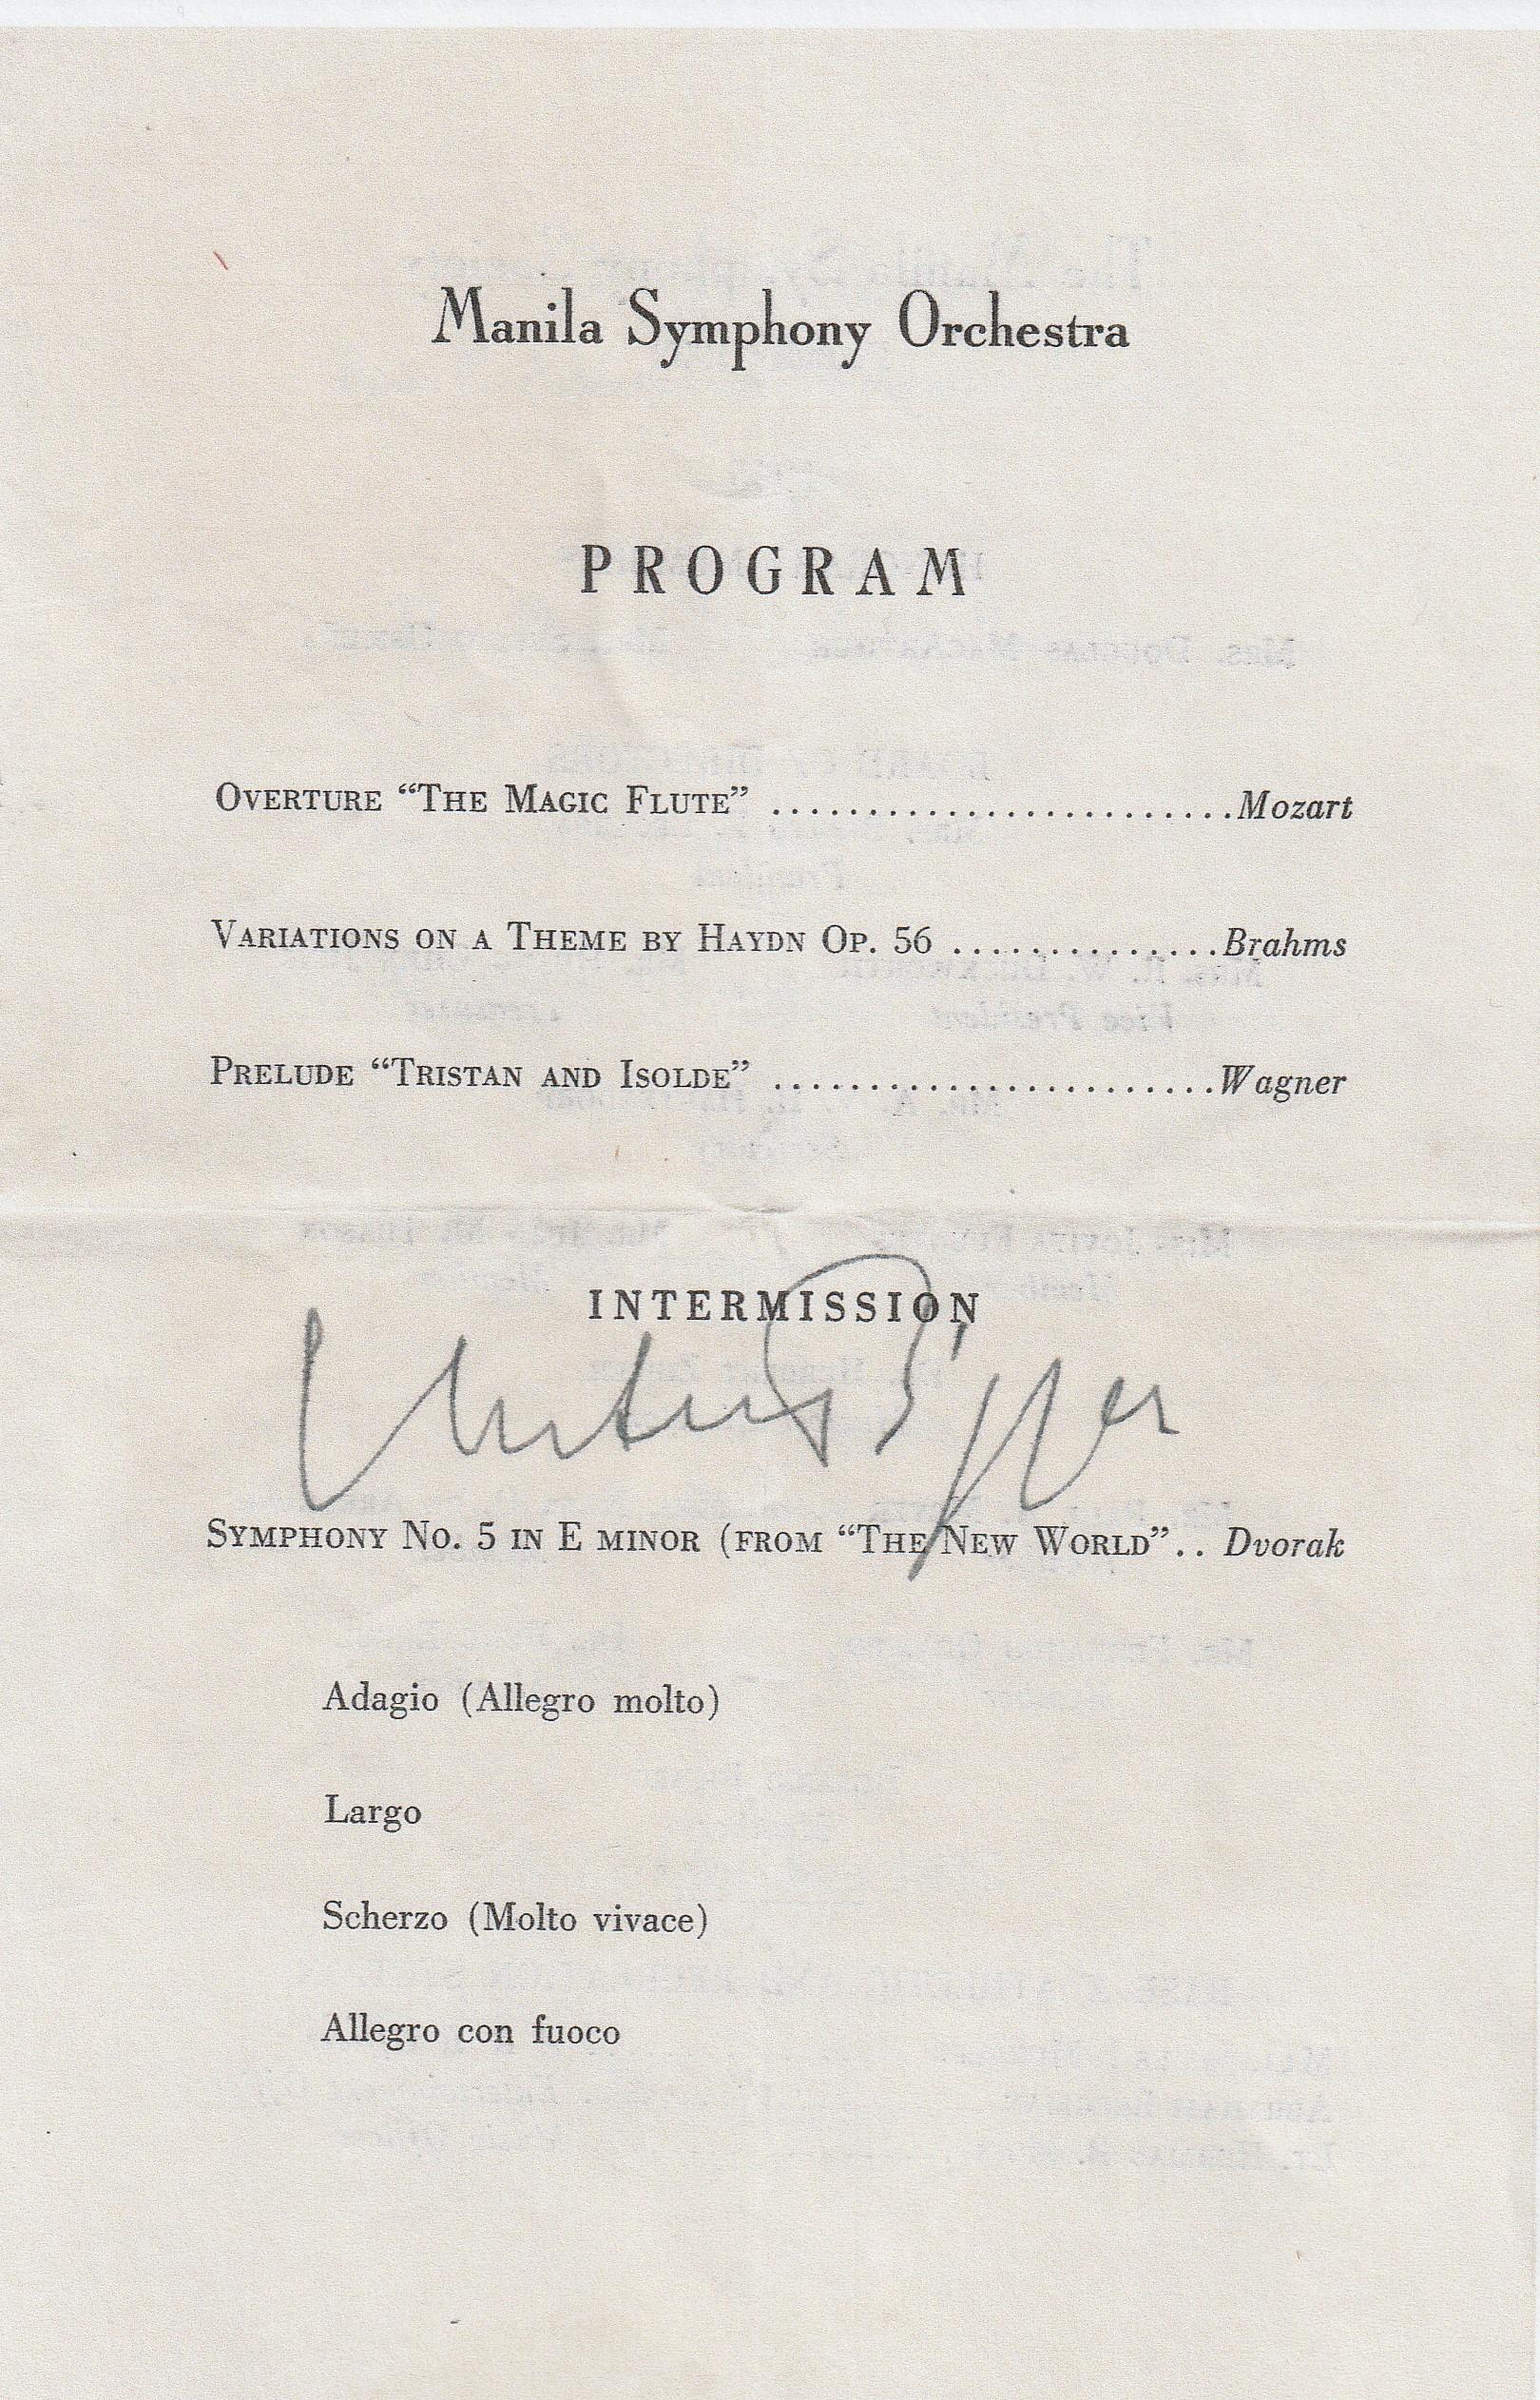 DPG - Manila Symphony Program (3) - October 11, 1945